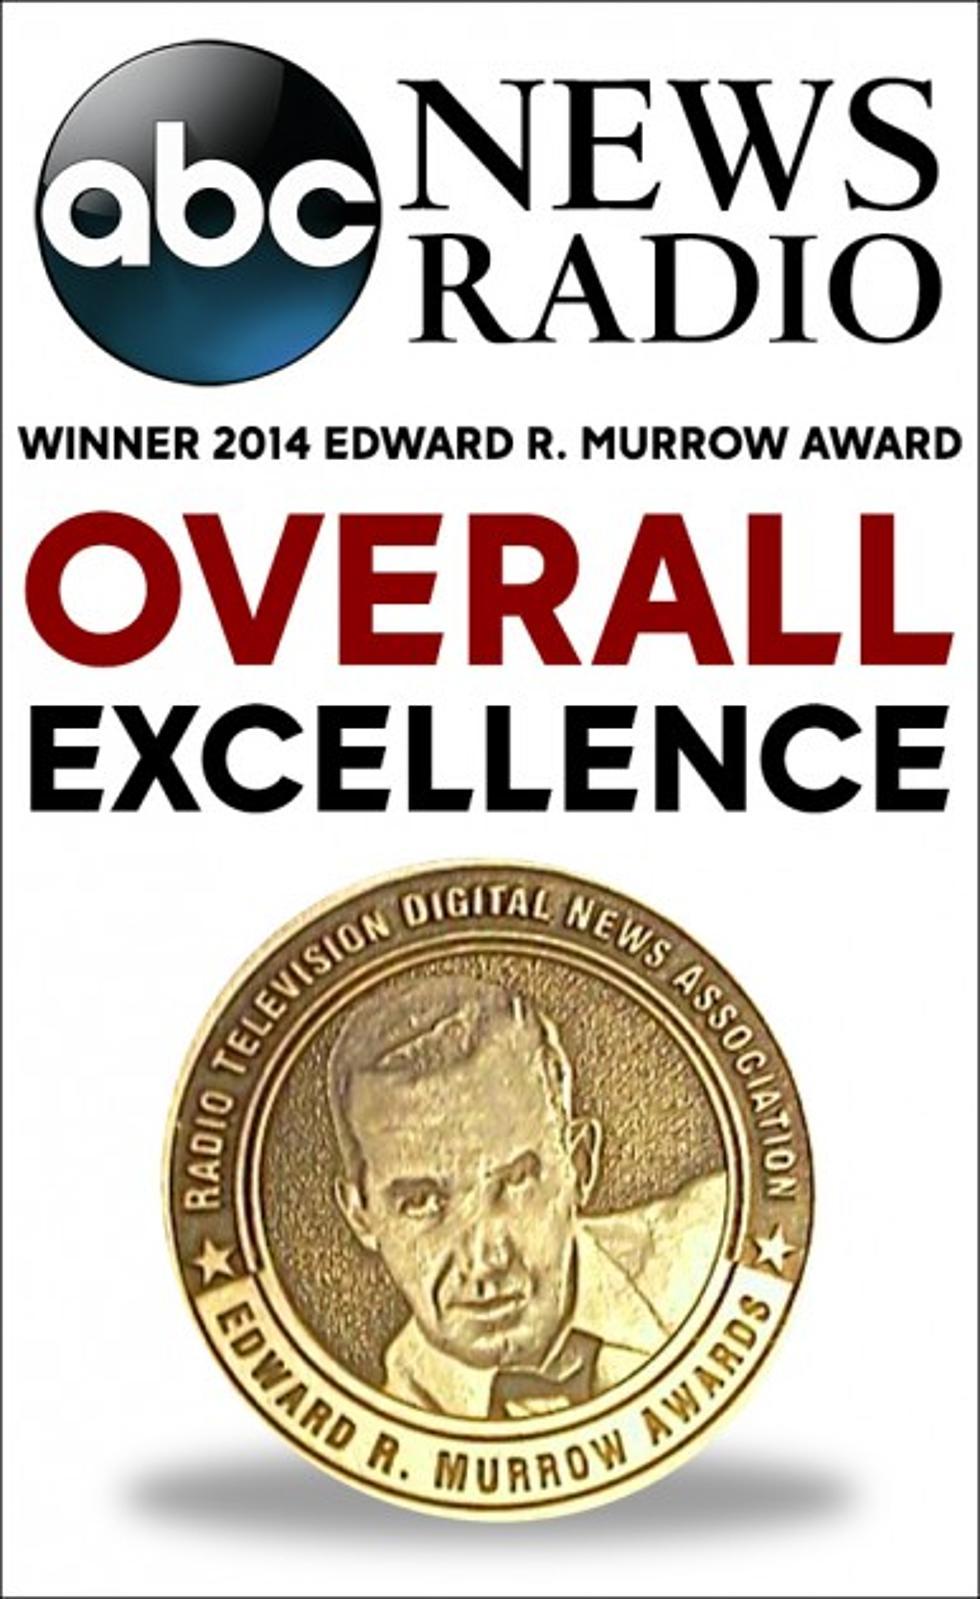 ABC News Radio Awarded with 2014 Edward R  Murrow Award for